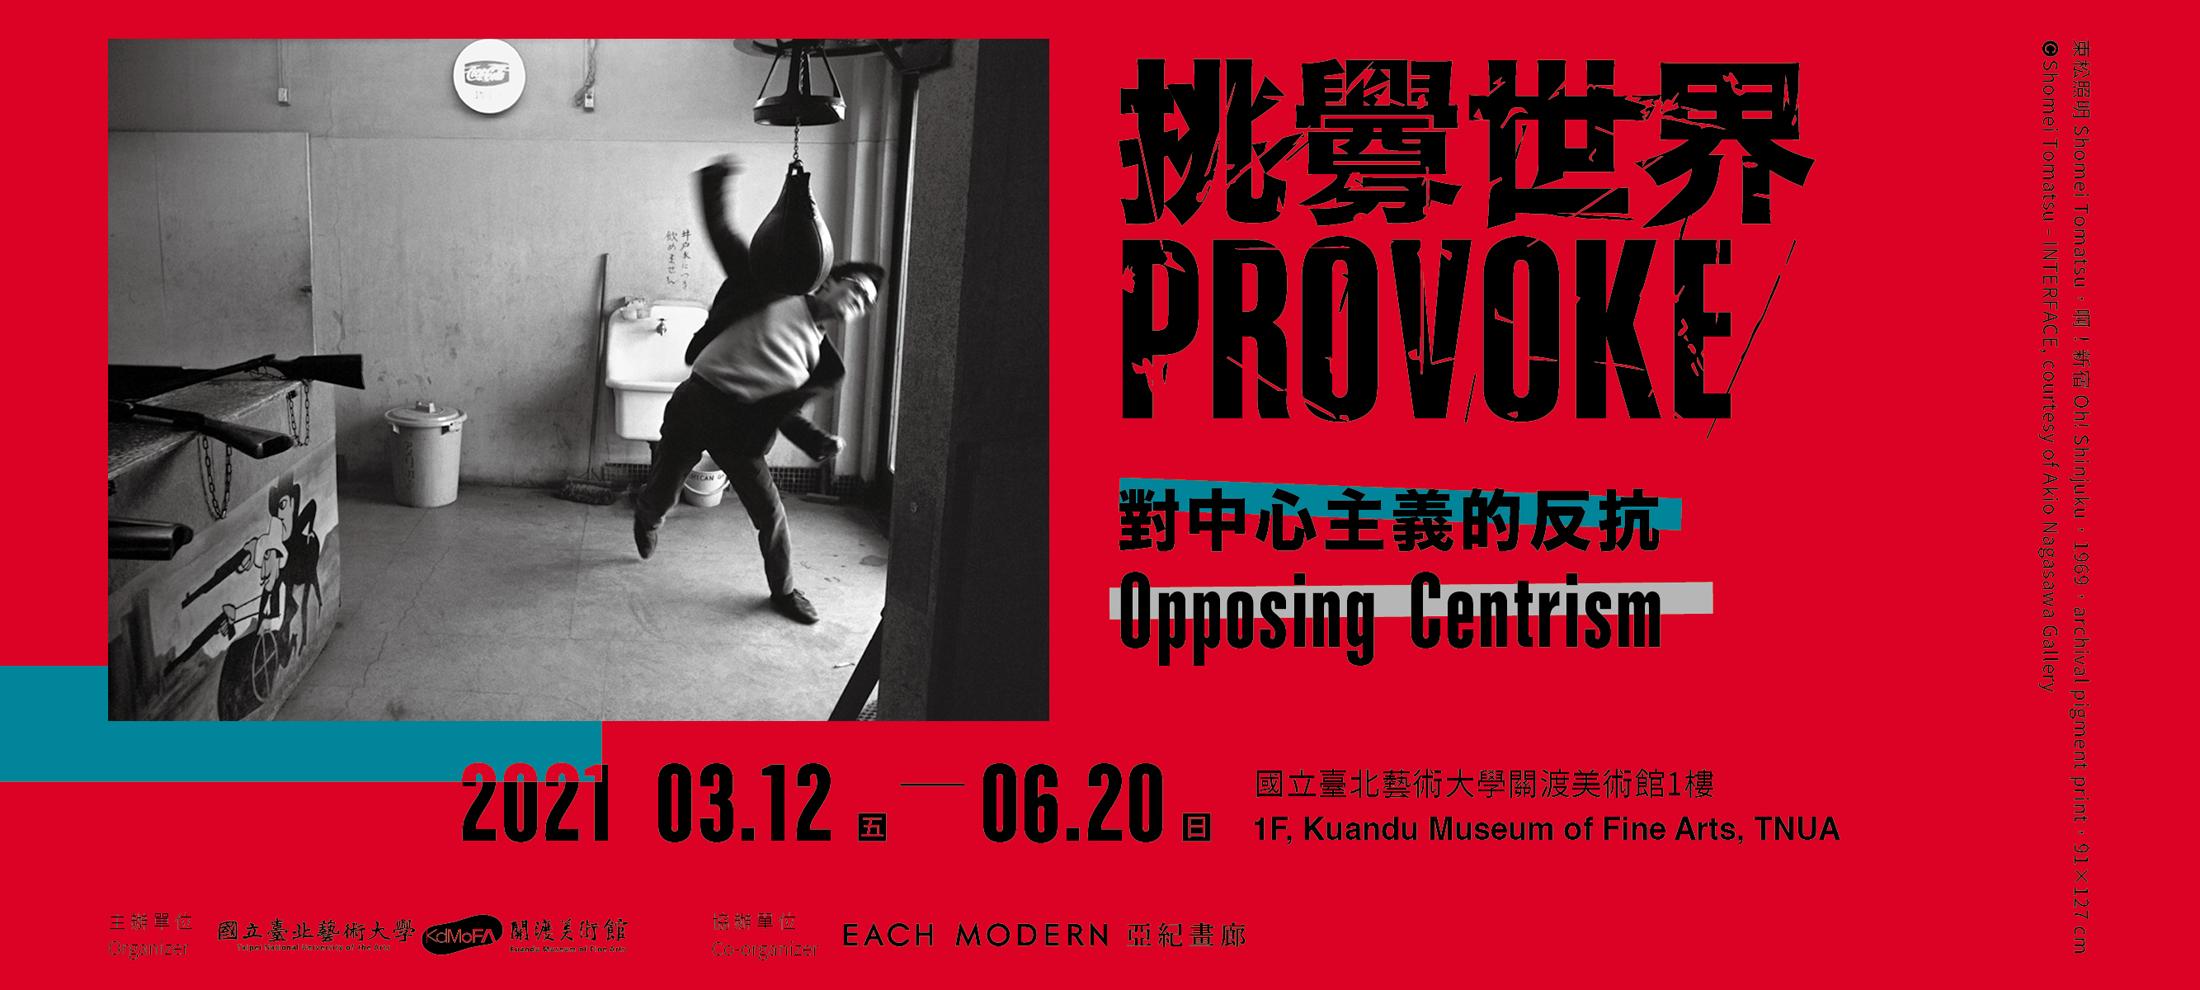 Provoke– Opposing Centrism